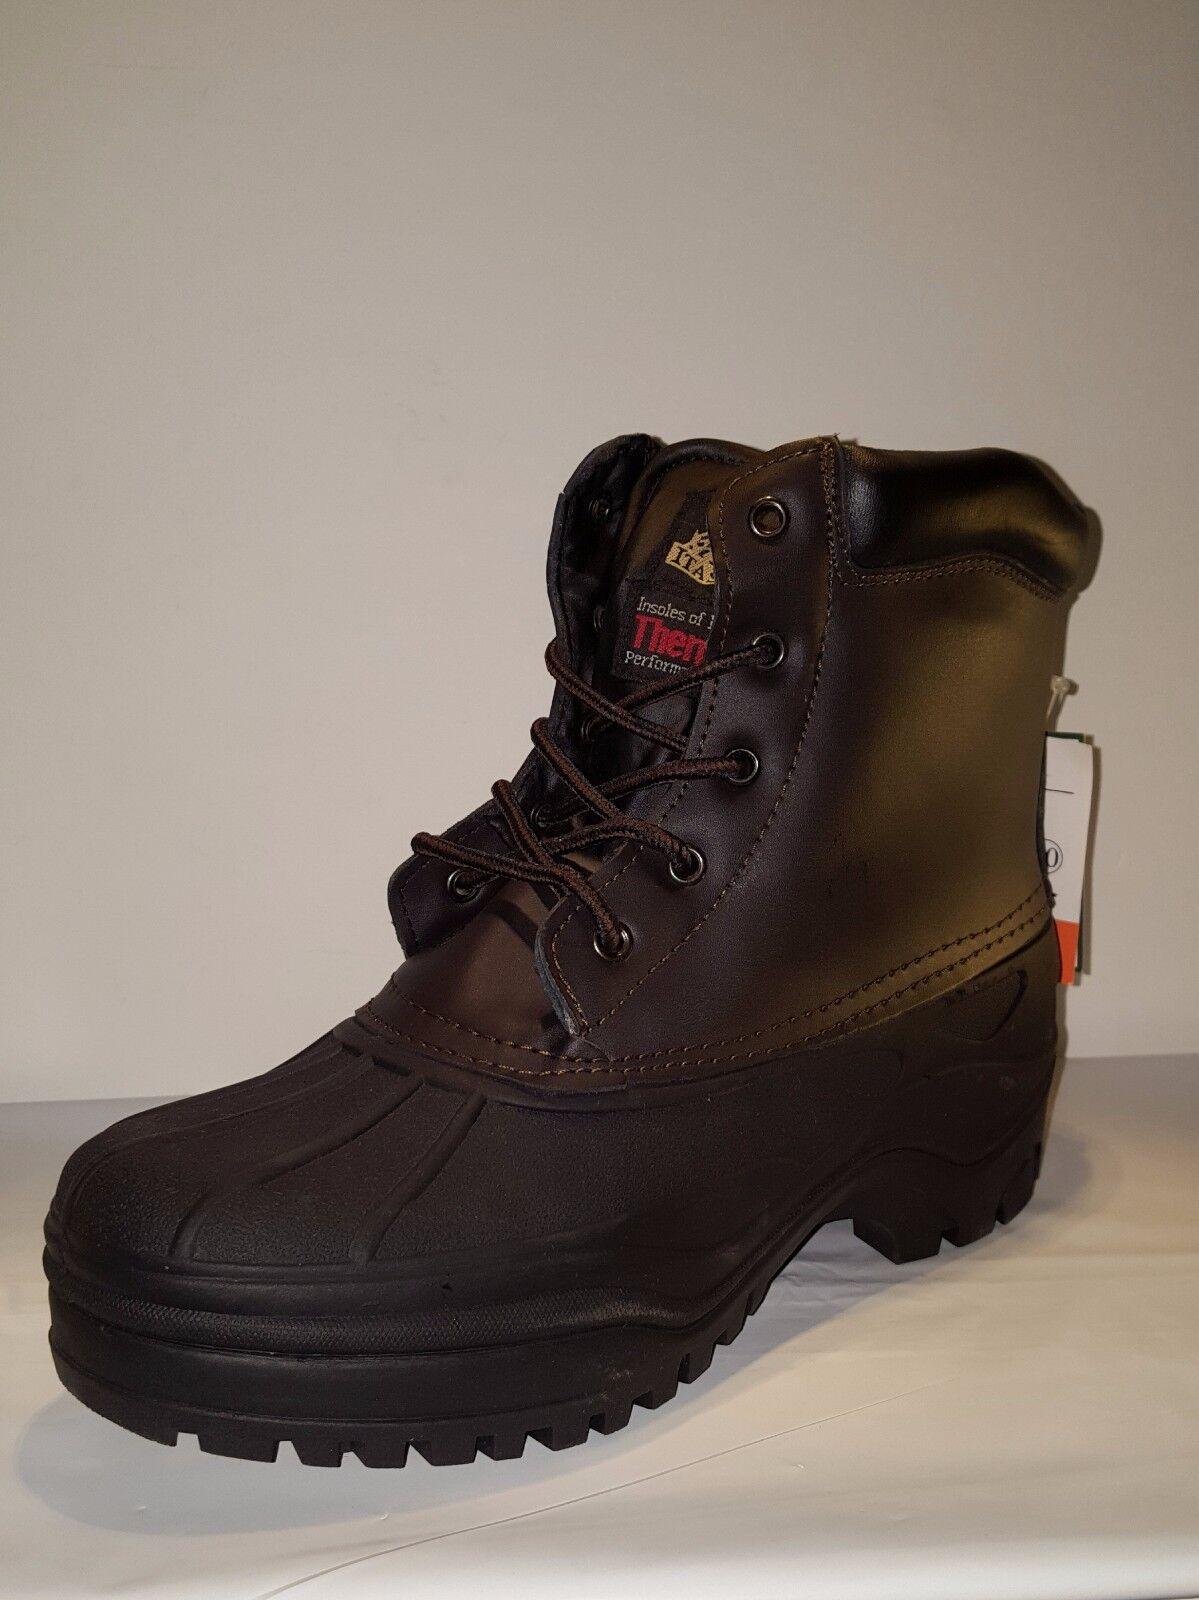 bfa55a0f7531 Мужские ботинки Itasca BLIZZARD Mens Brown 641270 Winter Boots